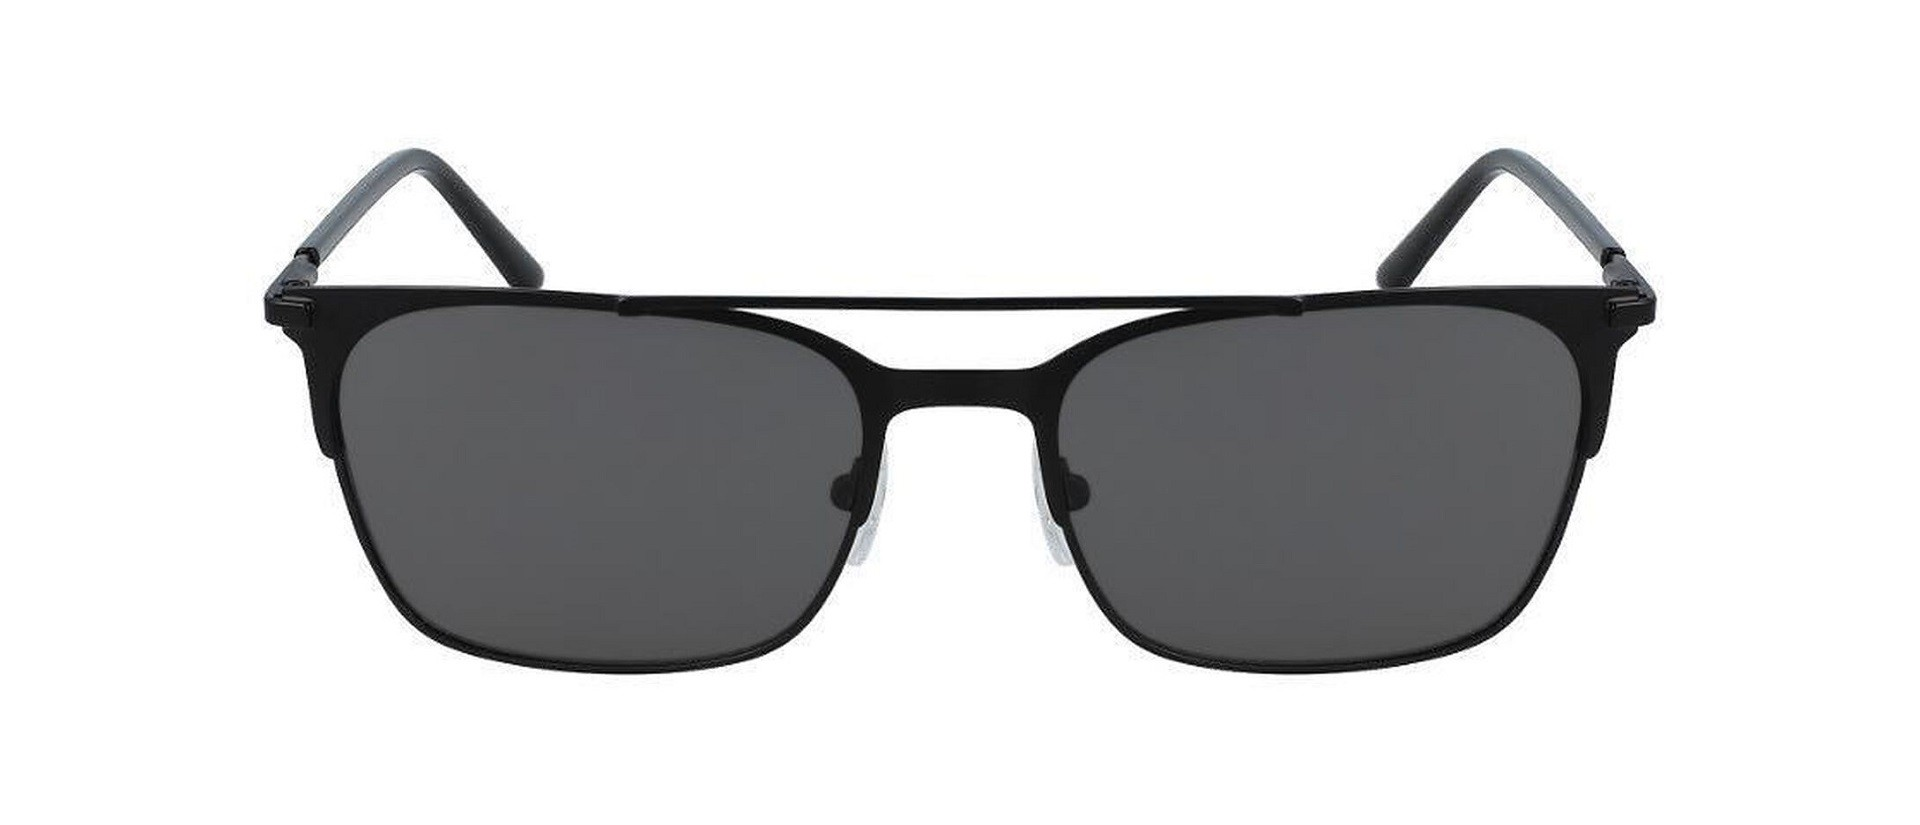 Óculos Calvin Klein Retangular CK19308S 201 56 Marrom